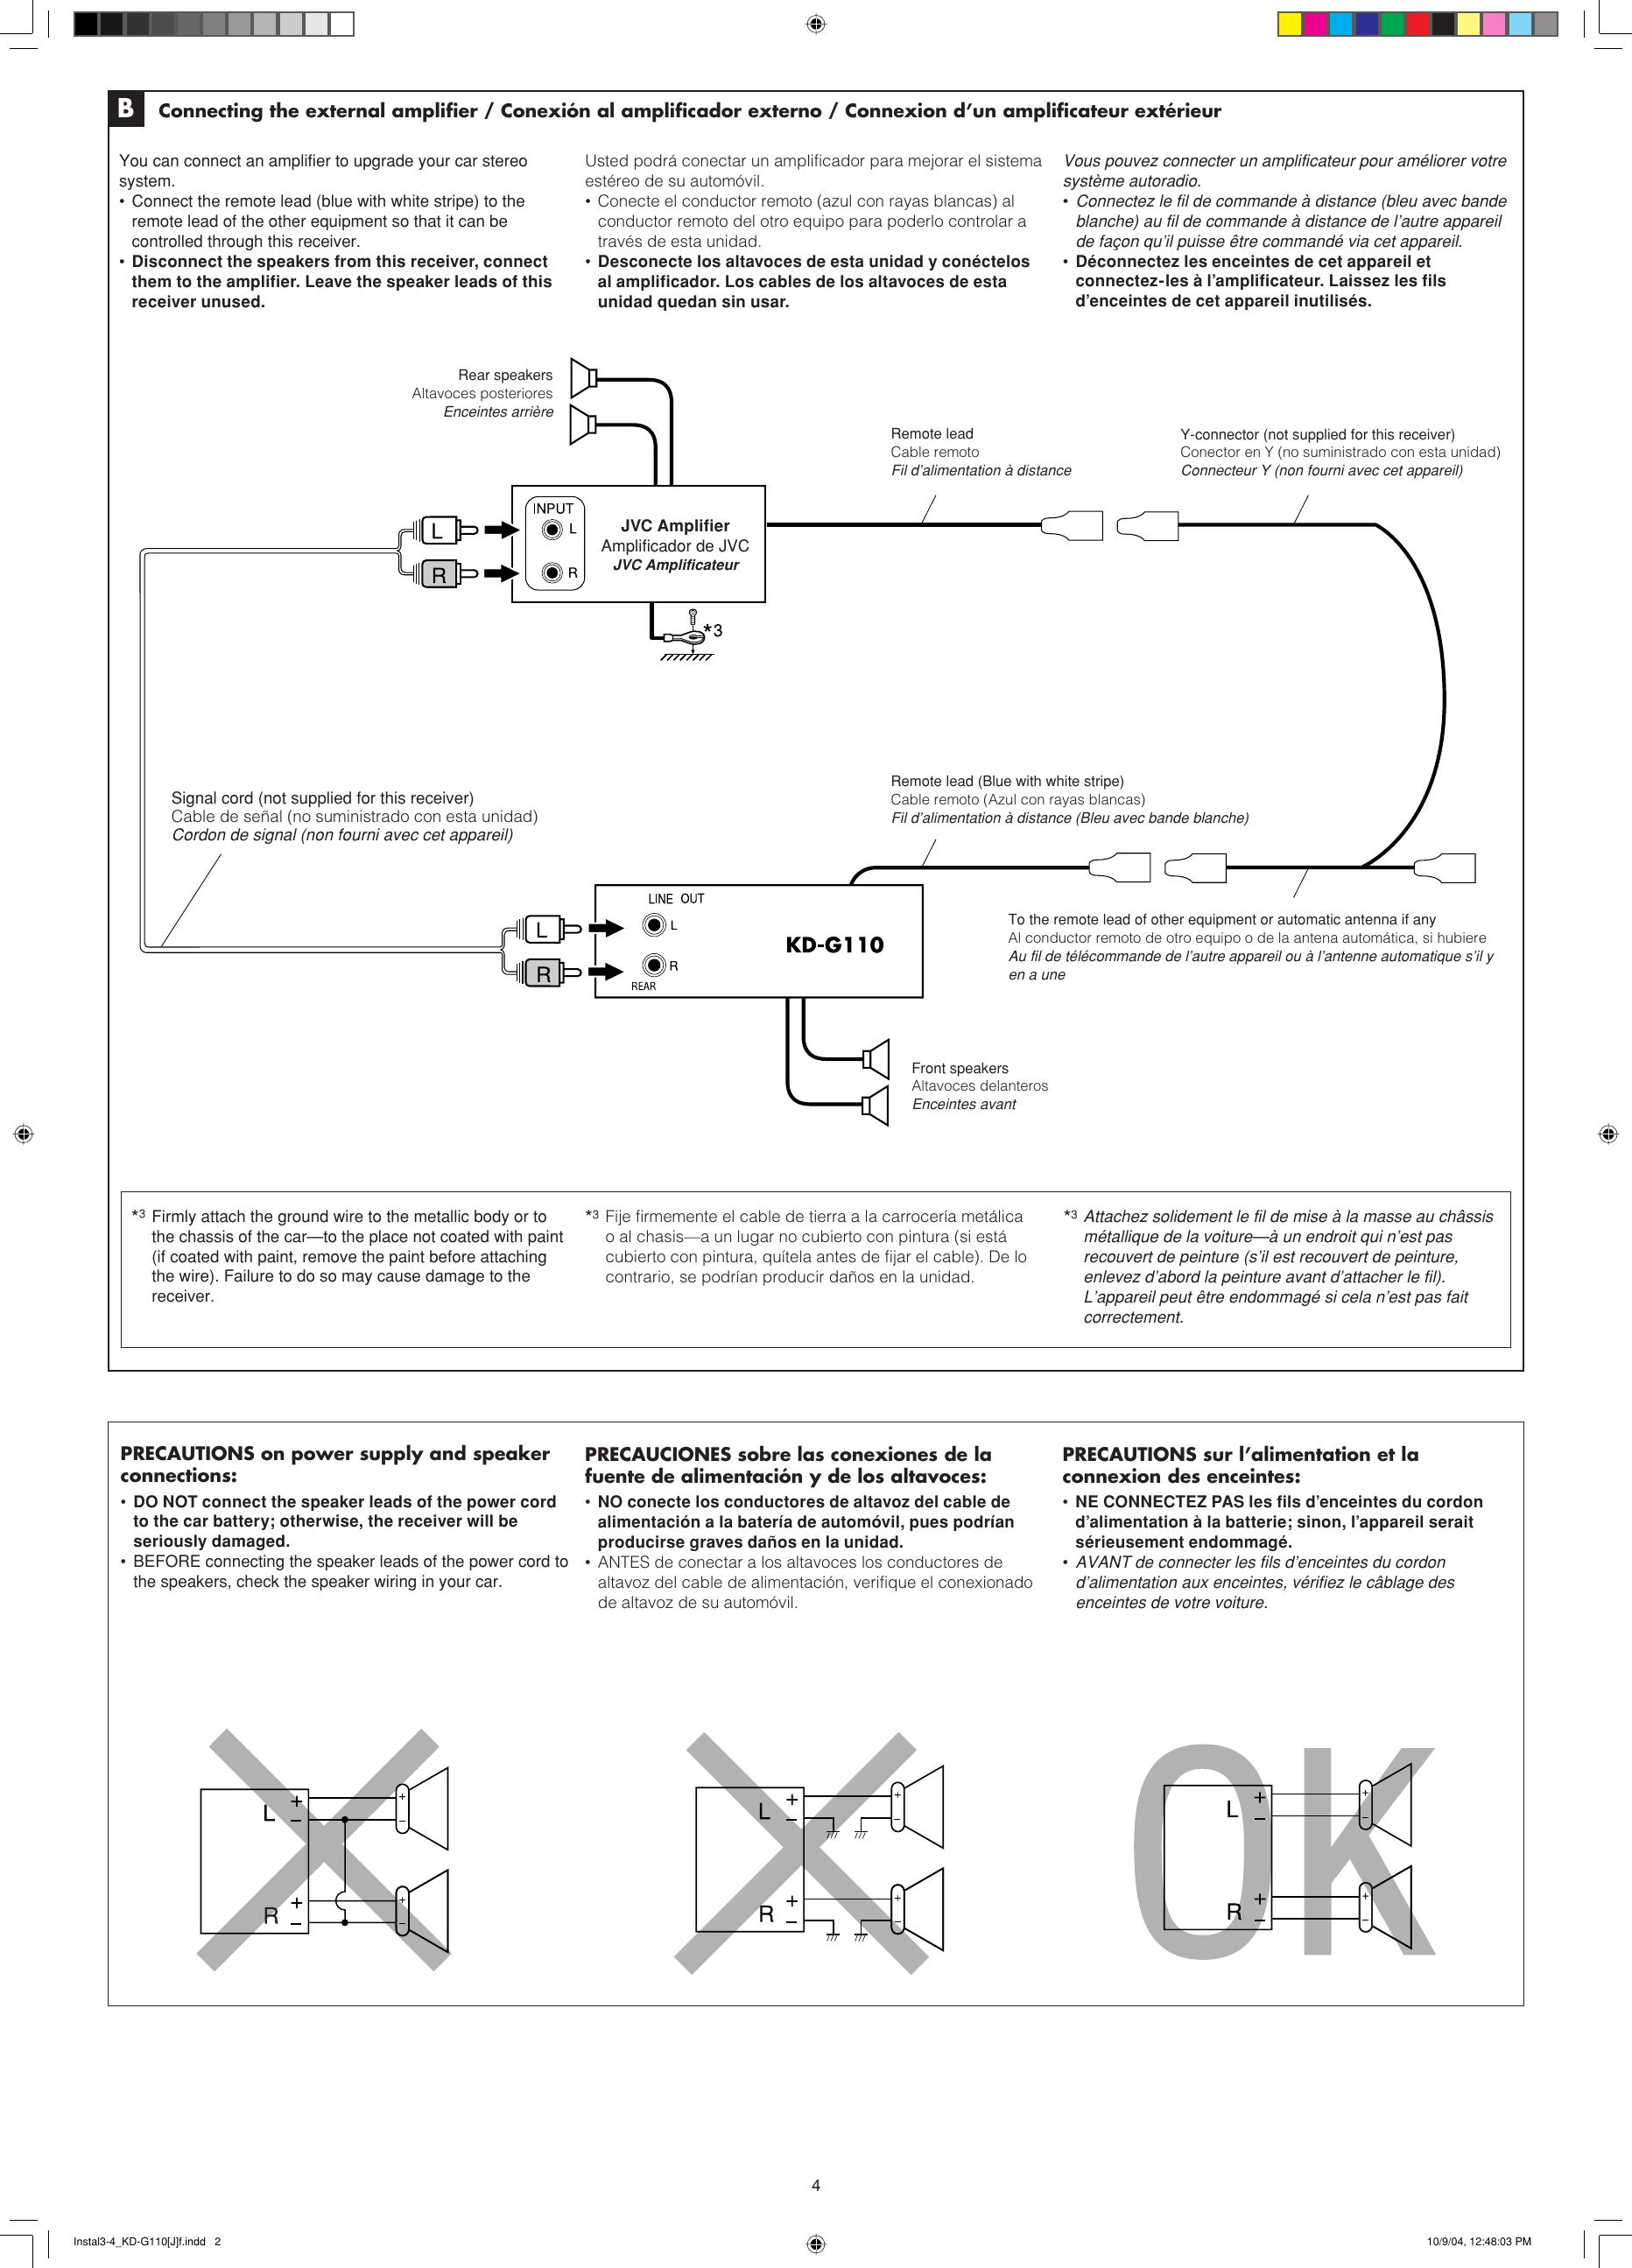 jvc kd g110 wiring diagram jvc kd g110 installation manual g110 j   jvc kd g110 installation manual g110 j